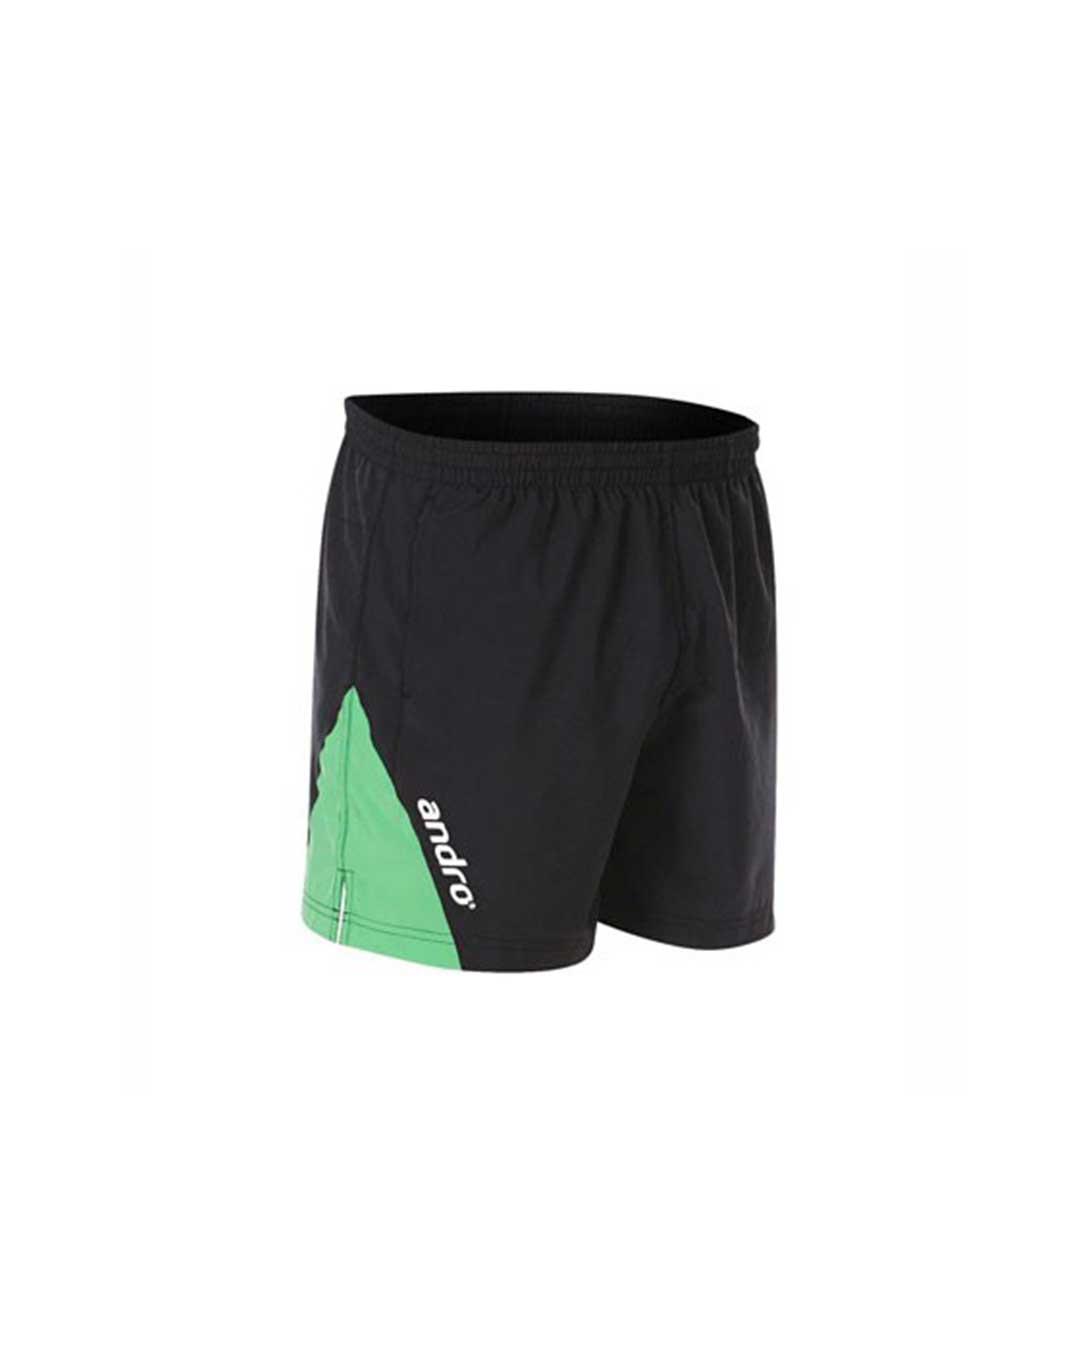 Short Andro Siran Hombre Negro/Verde